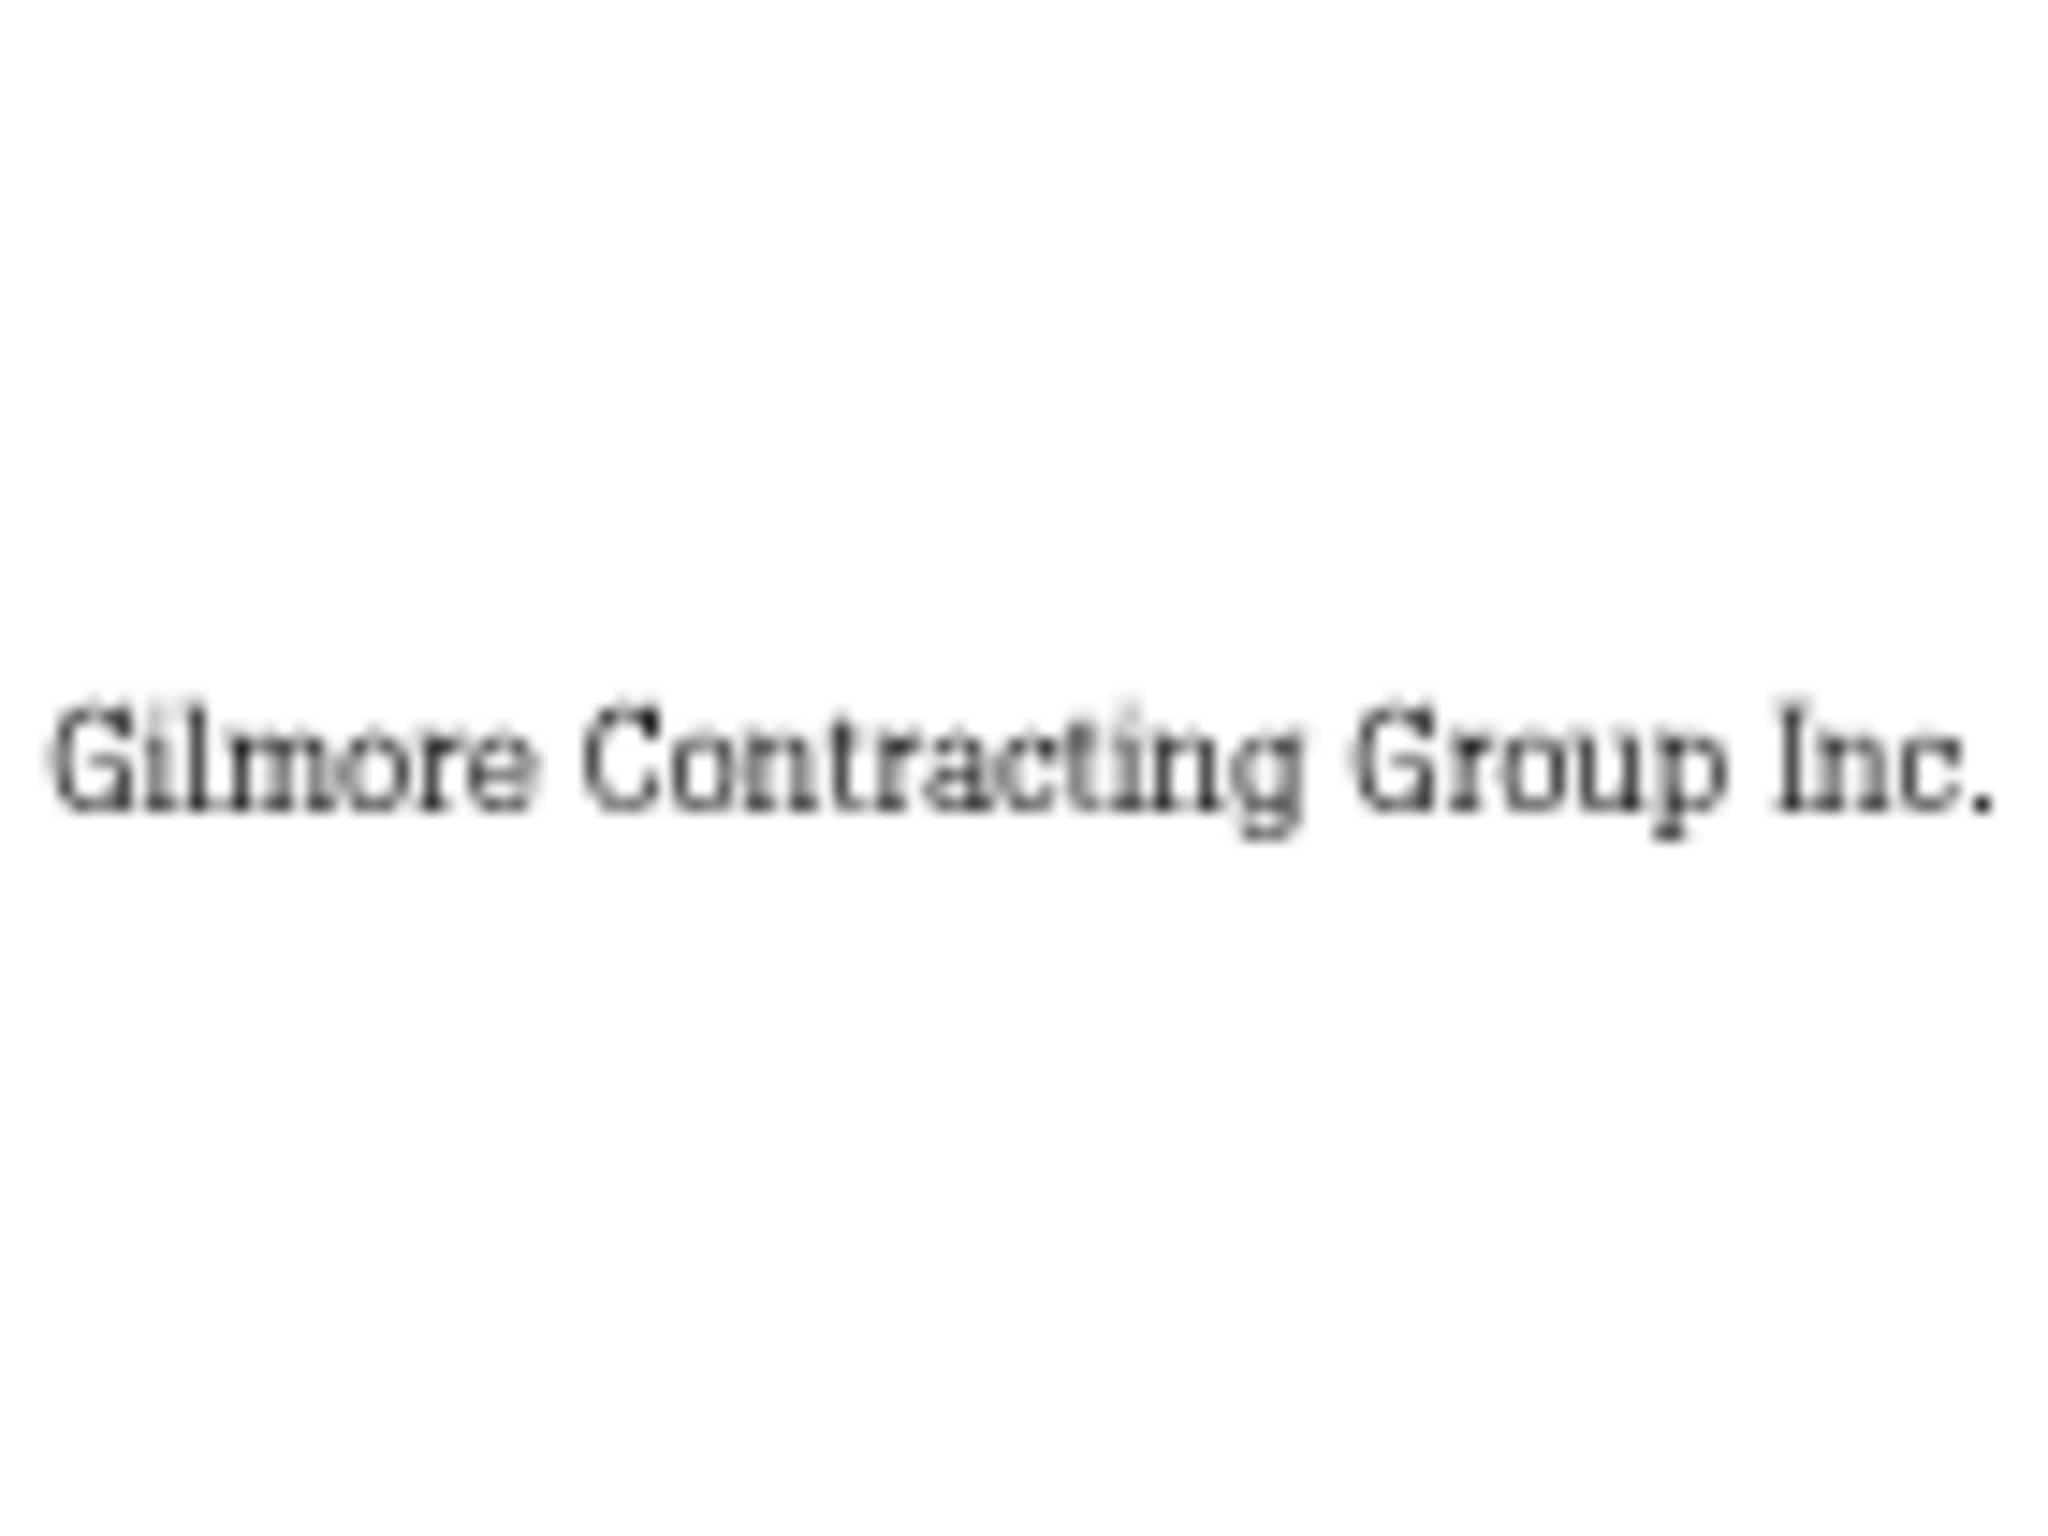 photo B E Gilmore Contracting Group